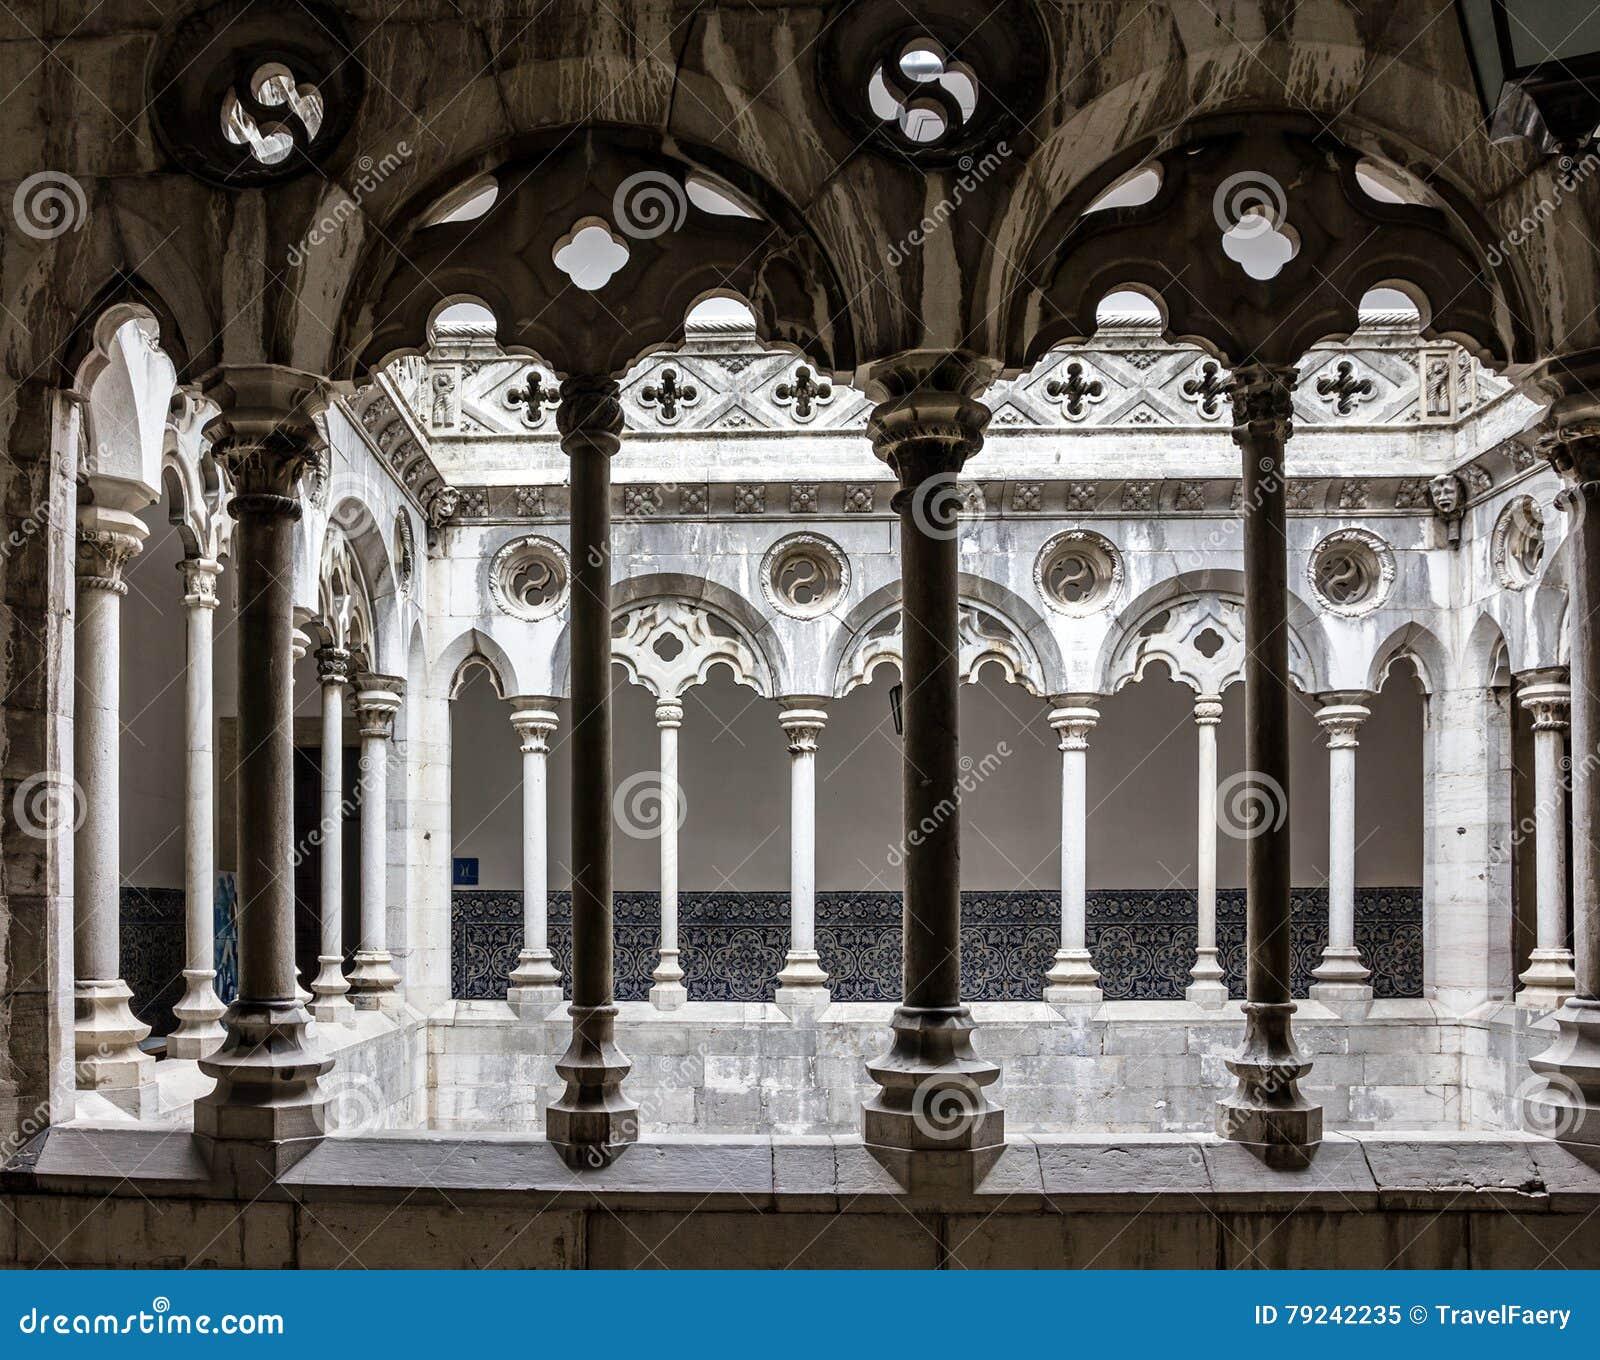 Tile Museum Portugal : Lisbon ceramic tile museum azulejo portugal